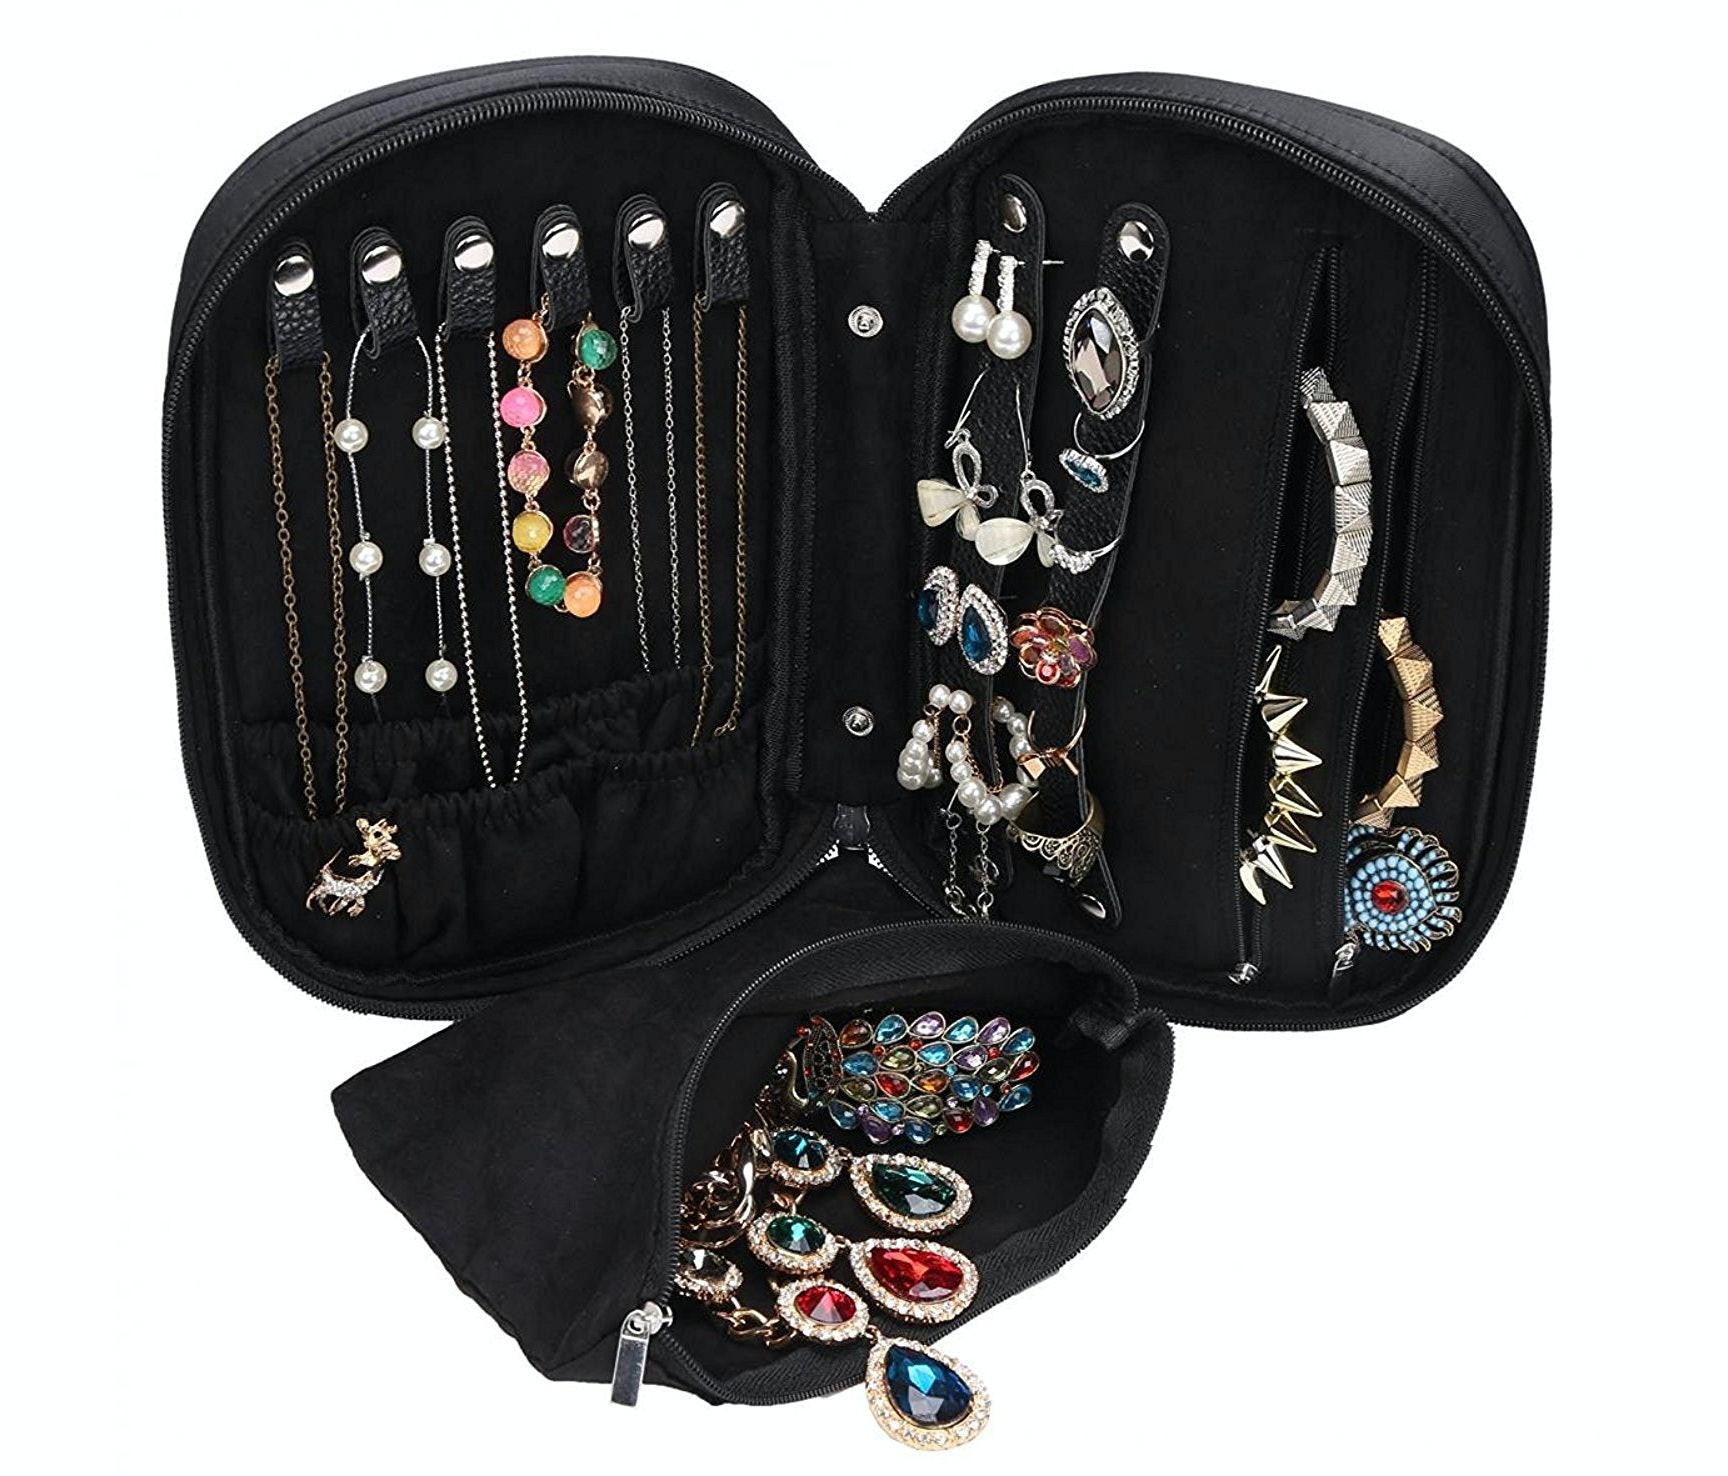 The 10 Best Travel Jewelry Organizers